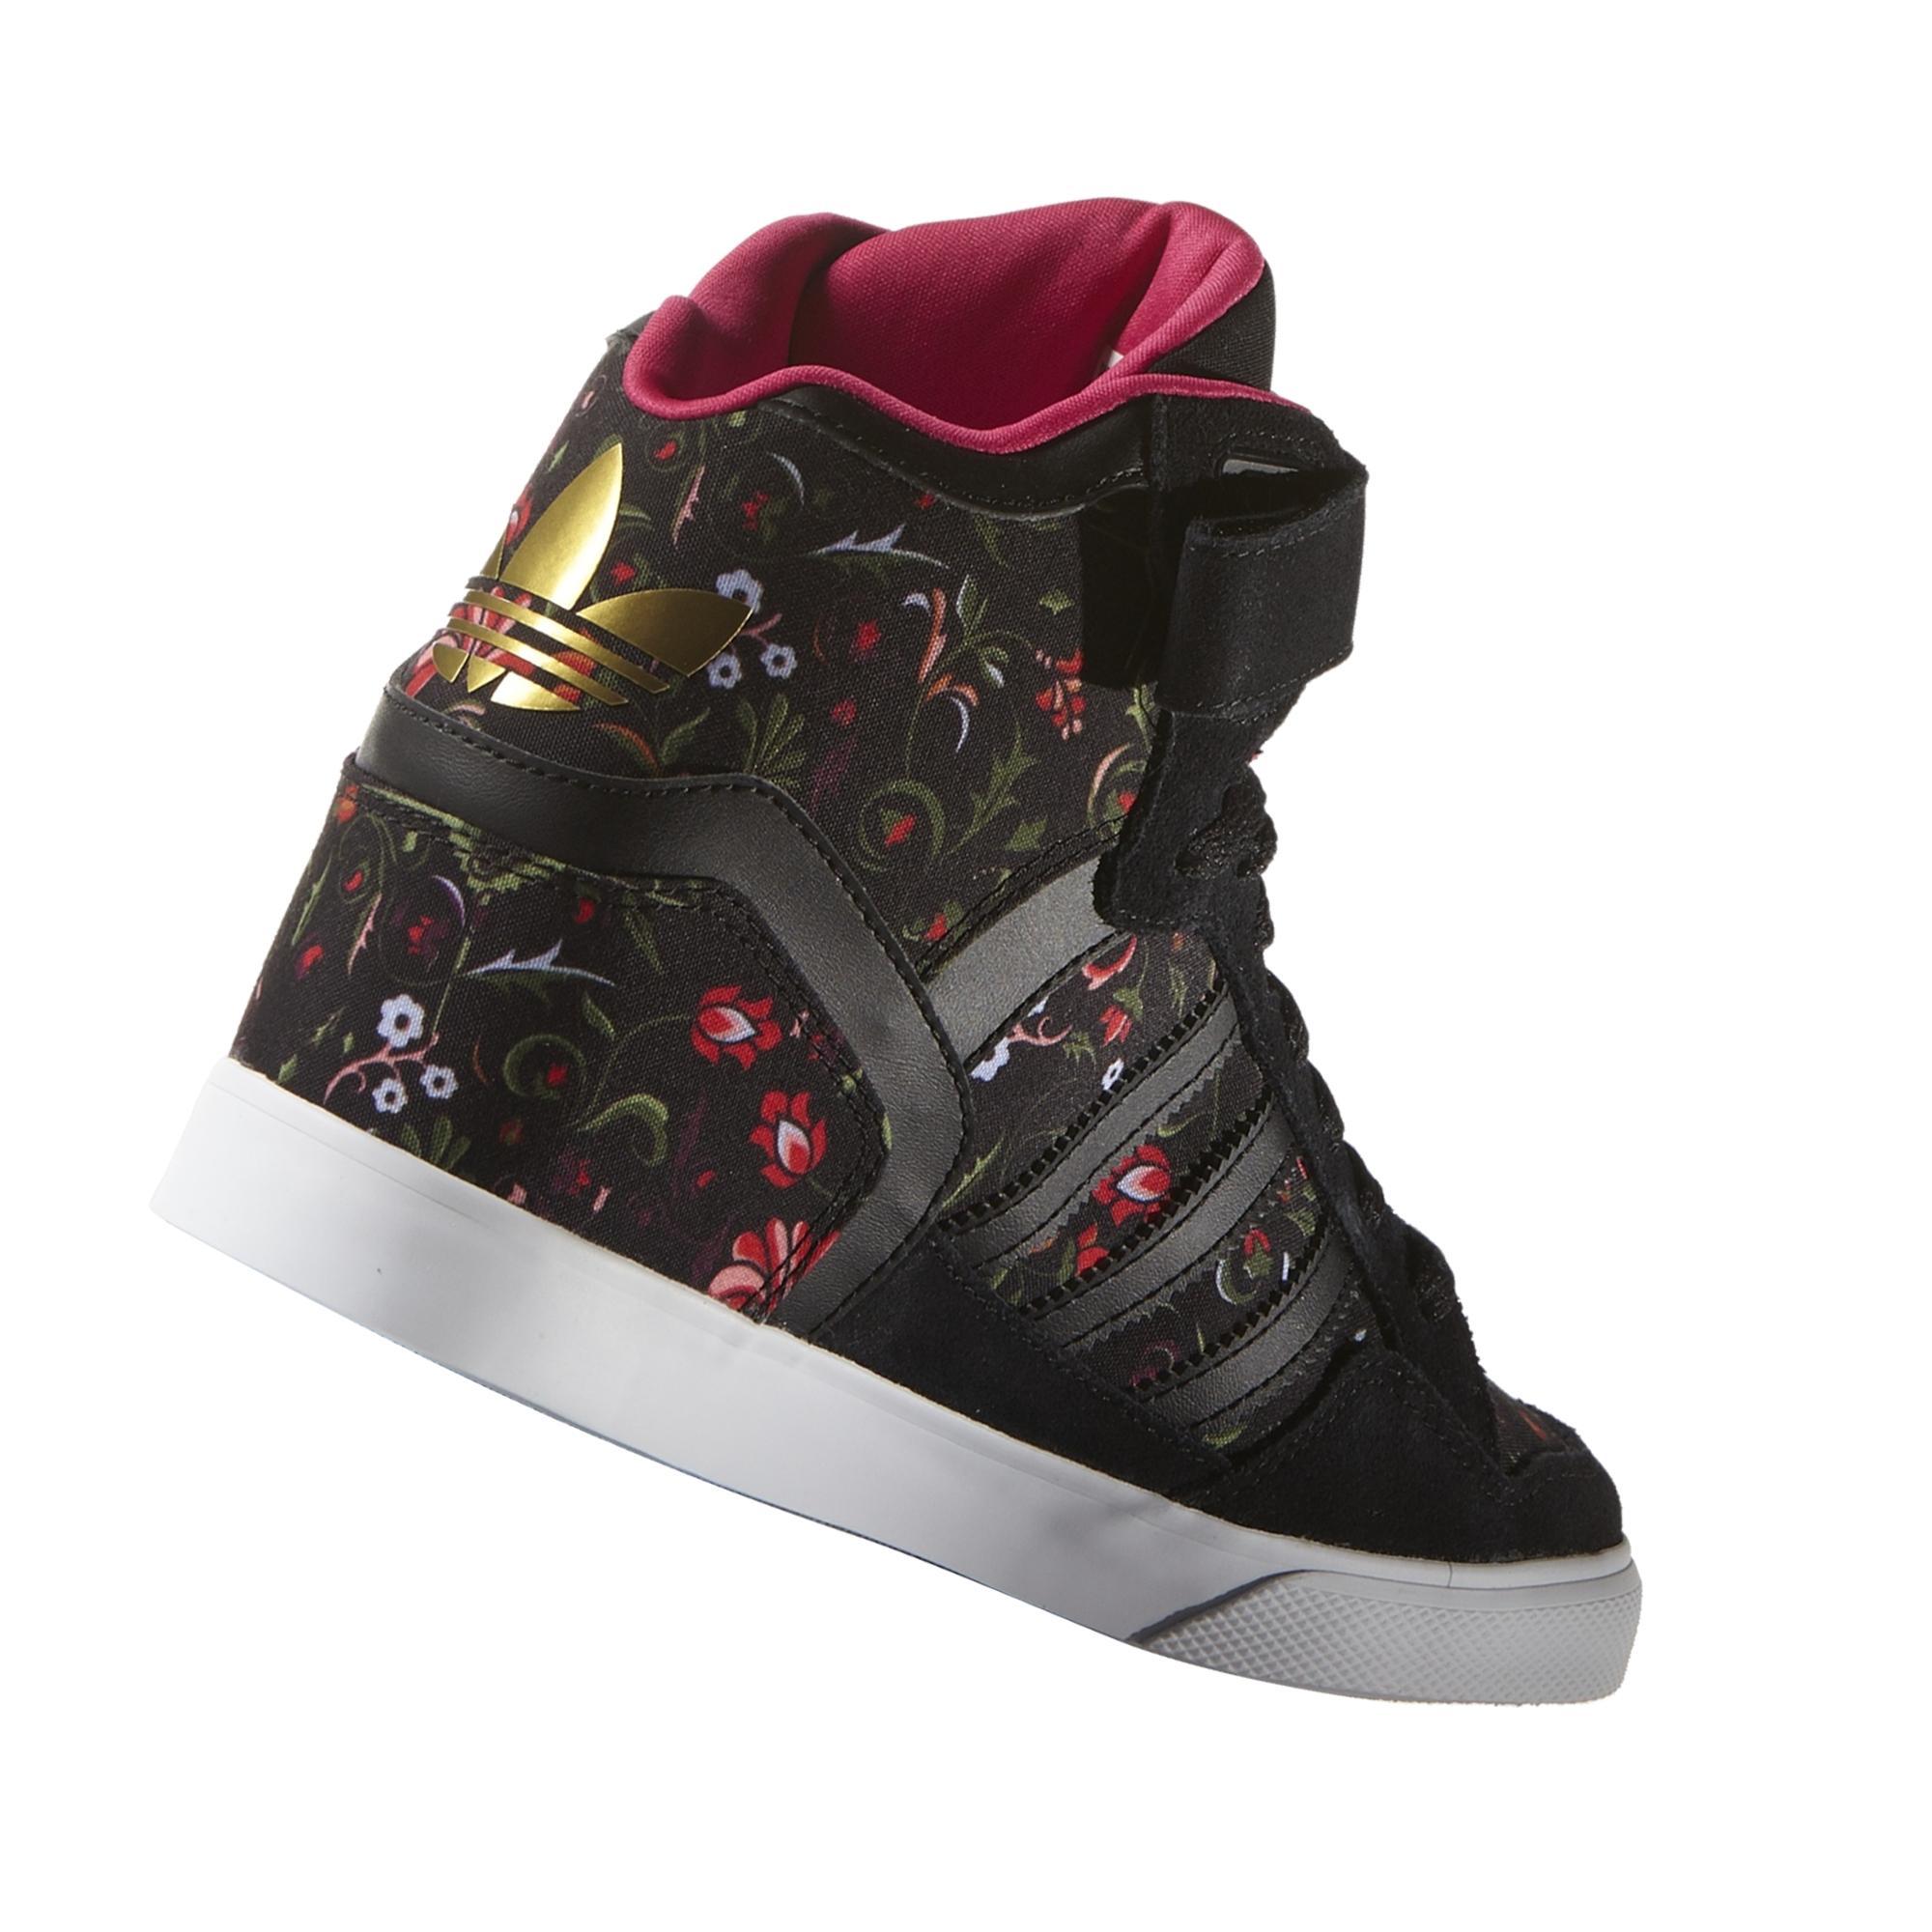 save off ead87 9c00a ... adidas Originals Extaball Up W Navy Pink Women Wedge Casual Shoes  Sneaker BY2330  adidas Extaball Up Kadın Spor Ayakkabı ...